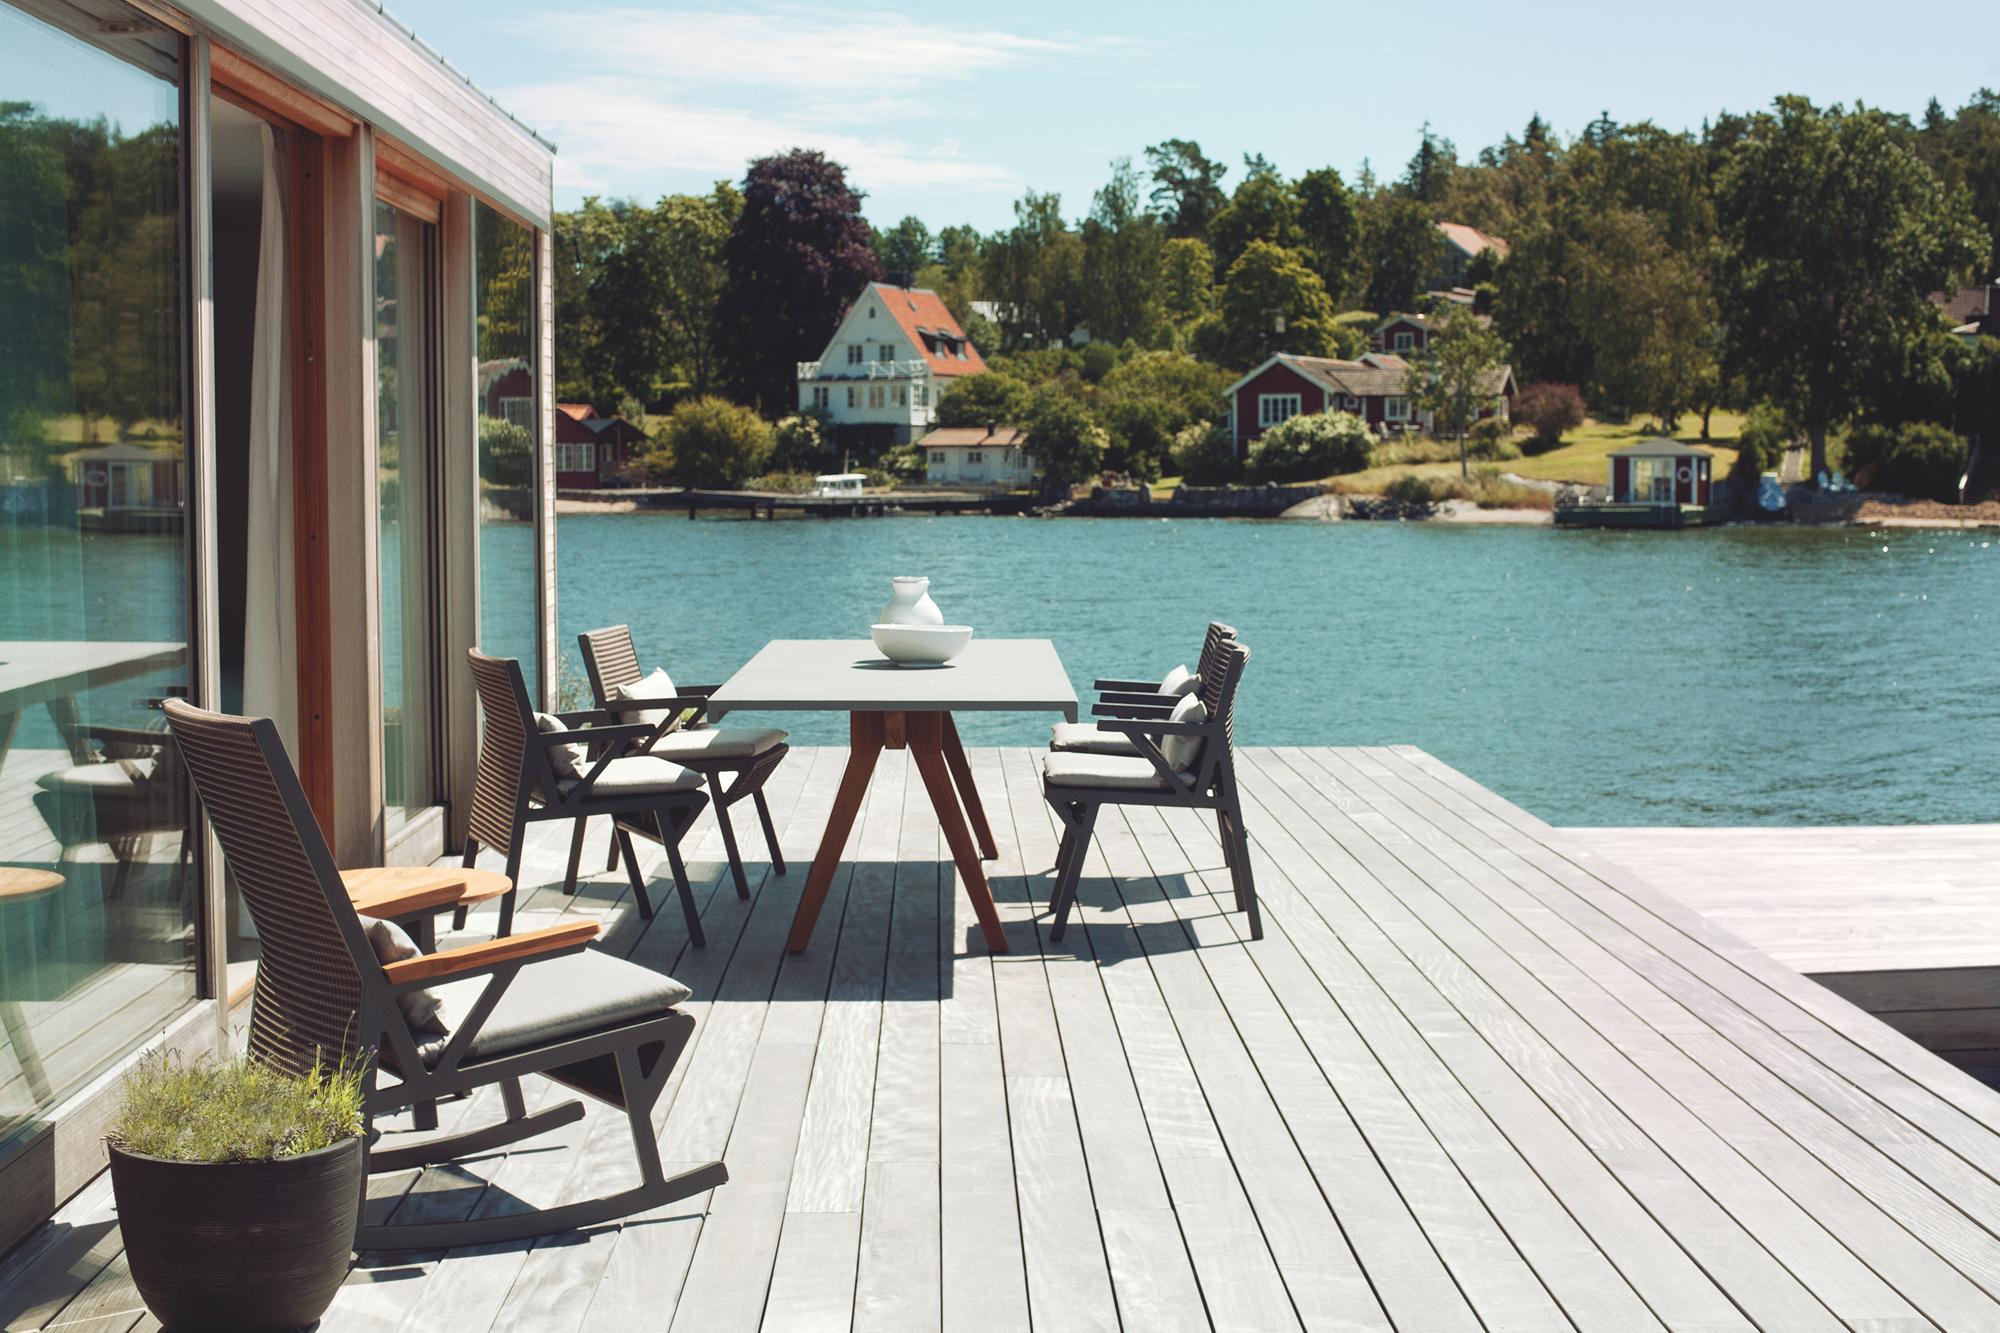 terrassenmöbel • bilder & ideen • couchstyle, Hause deko